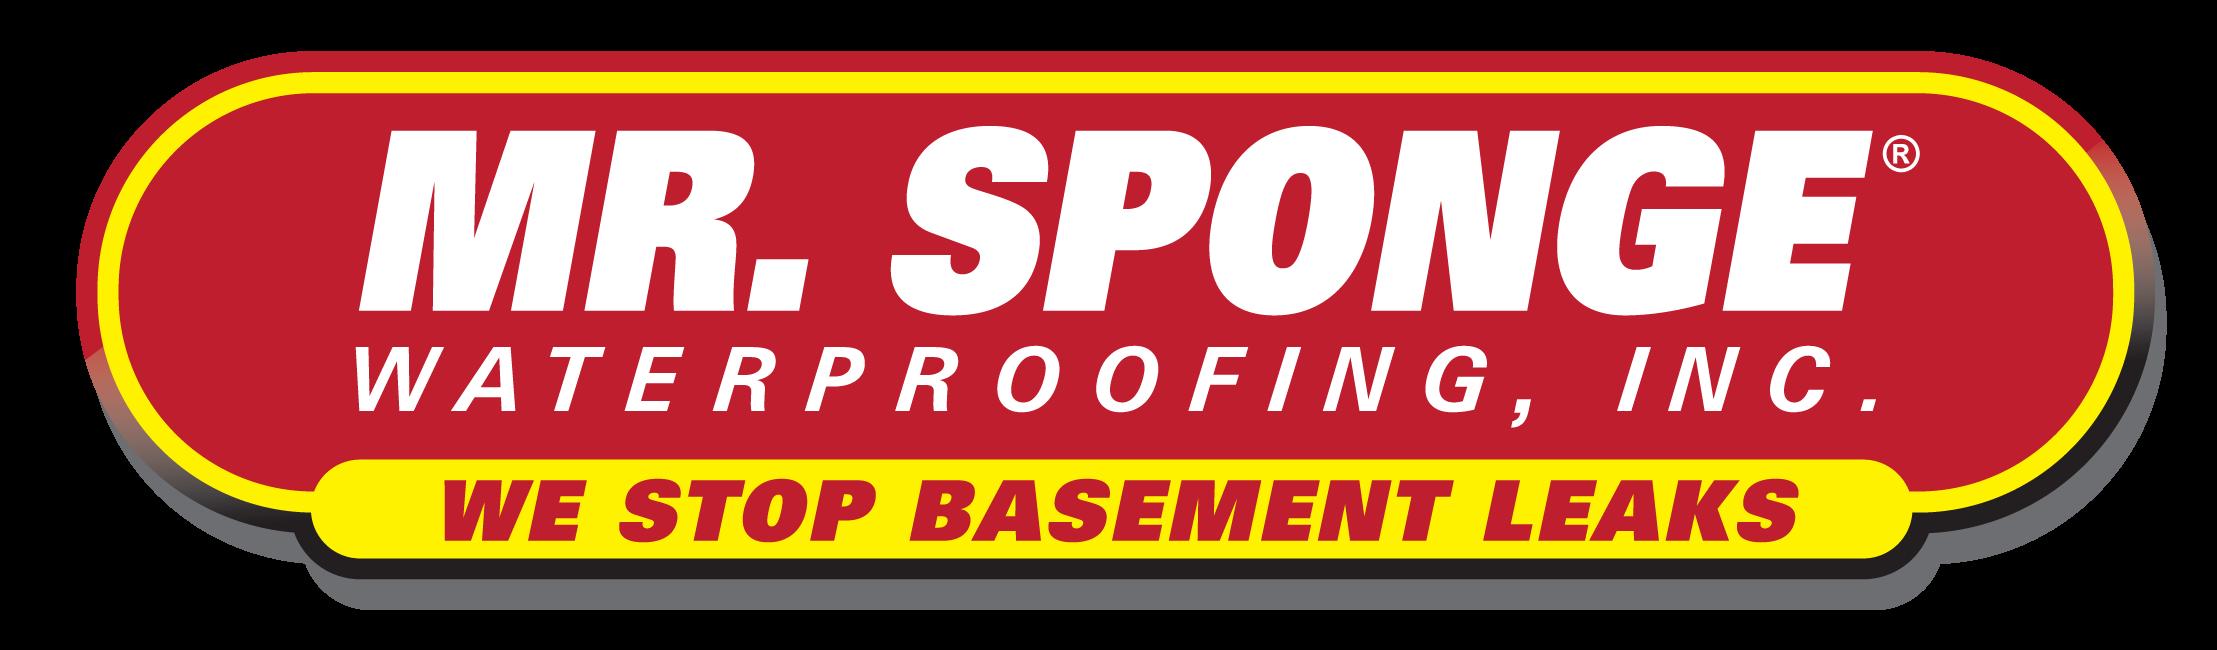 Mr. Sponge Waterproofing, Inc.